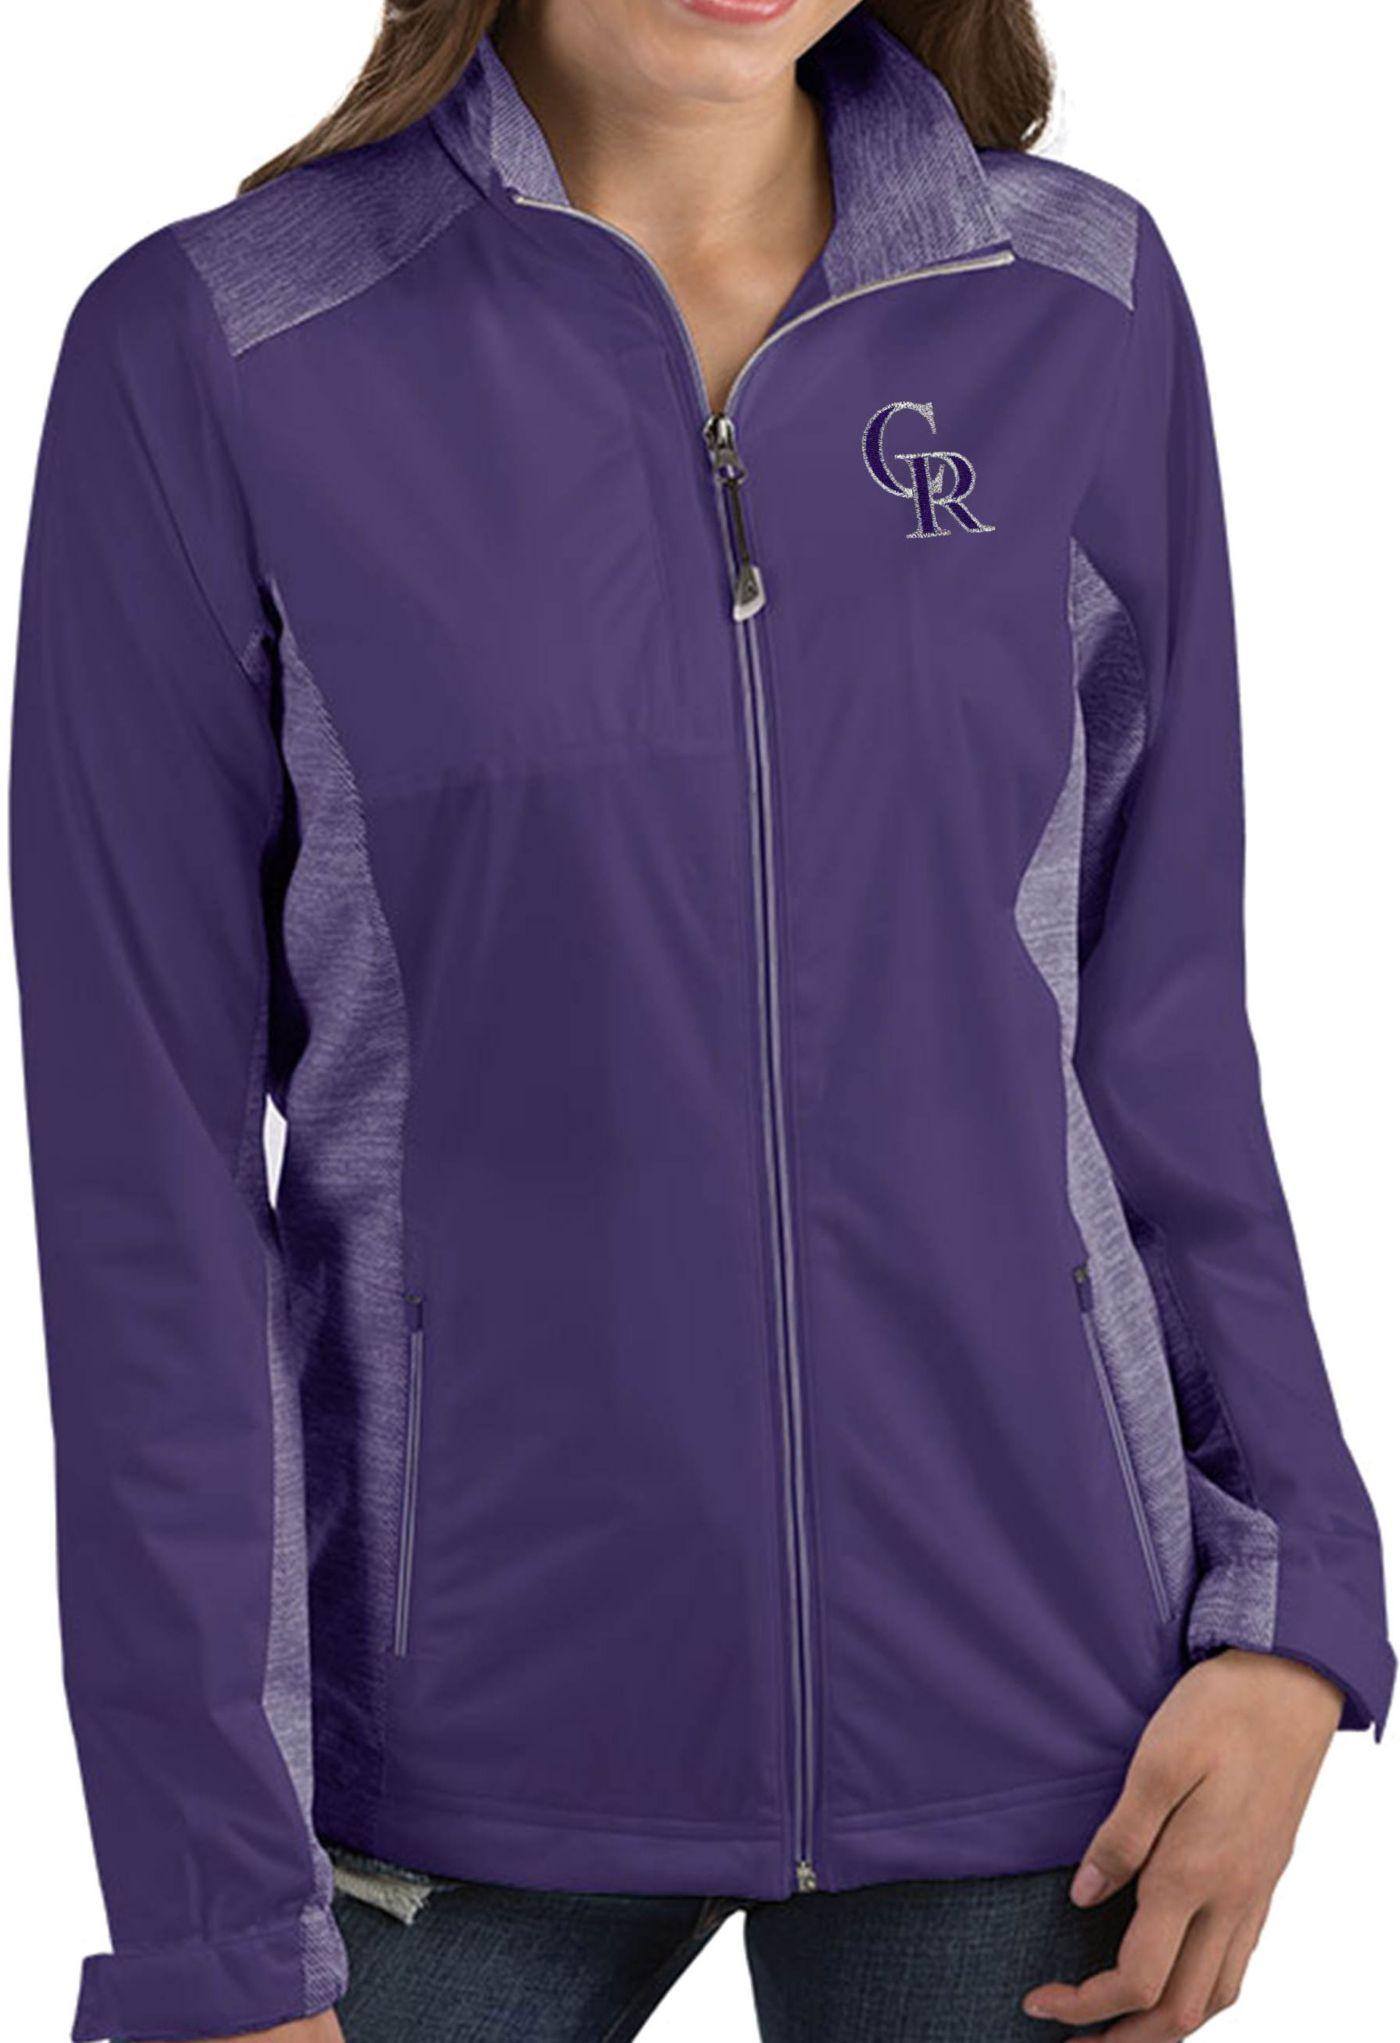 Antigua Women's Colorado Rockies Revolve Purple Full-Zip Jacket